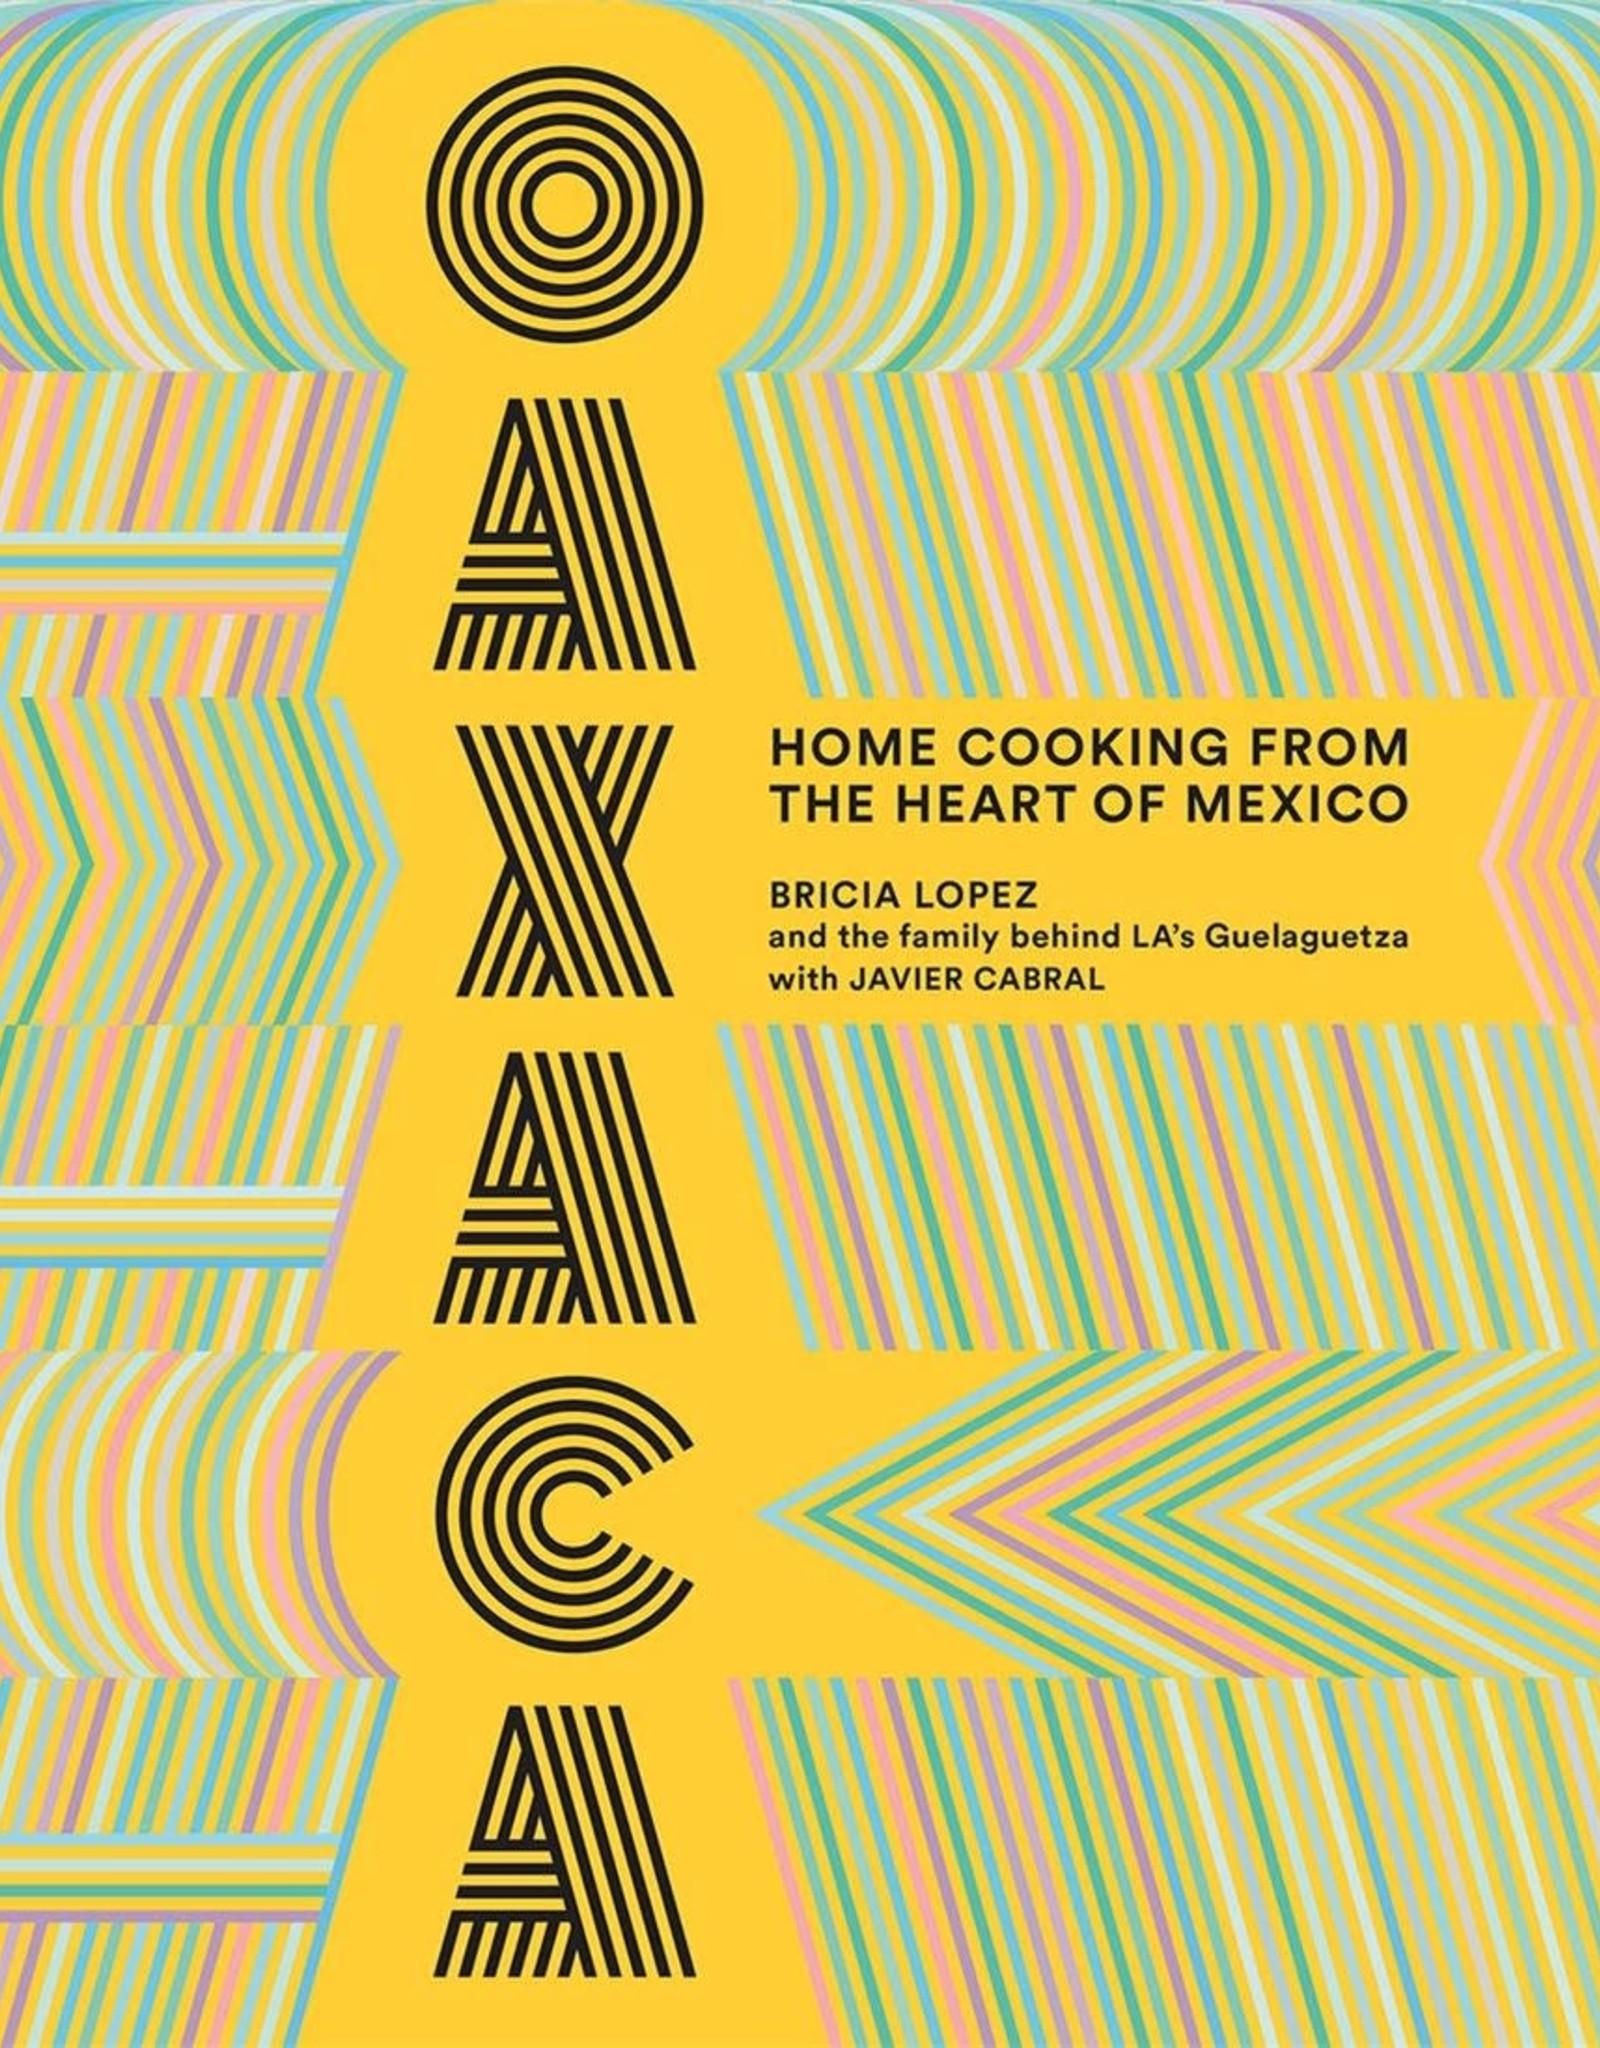 Common Ground Distributors OAXACA Home Cooking